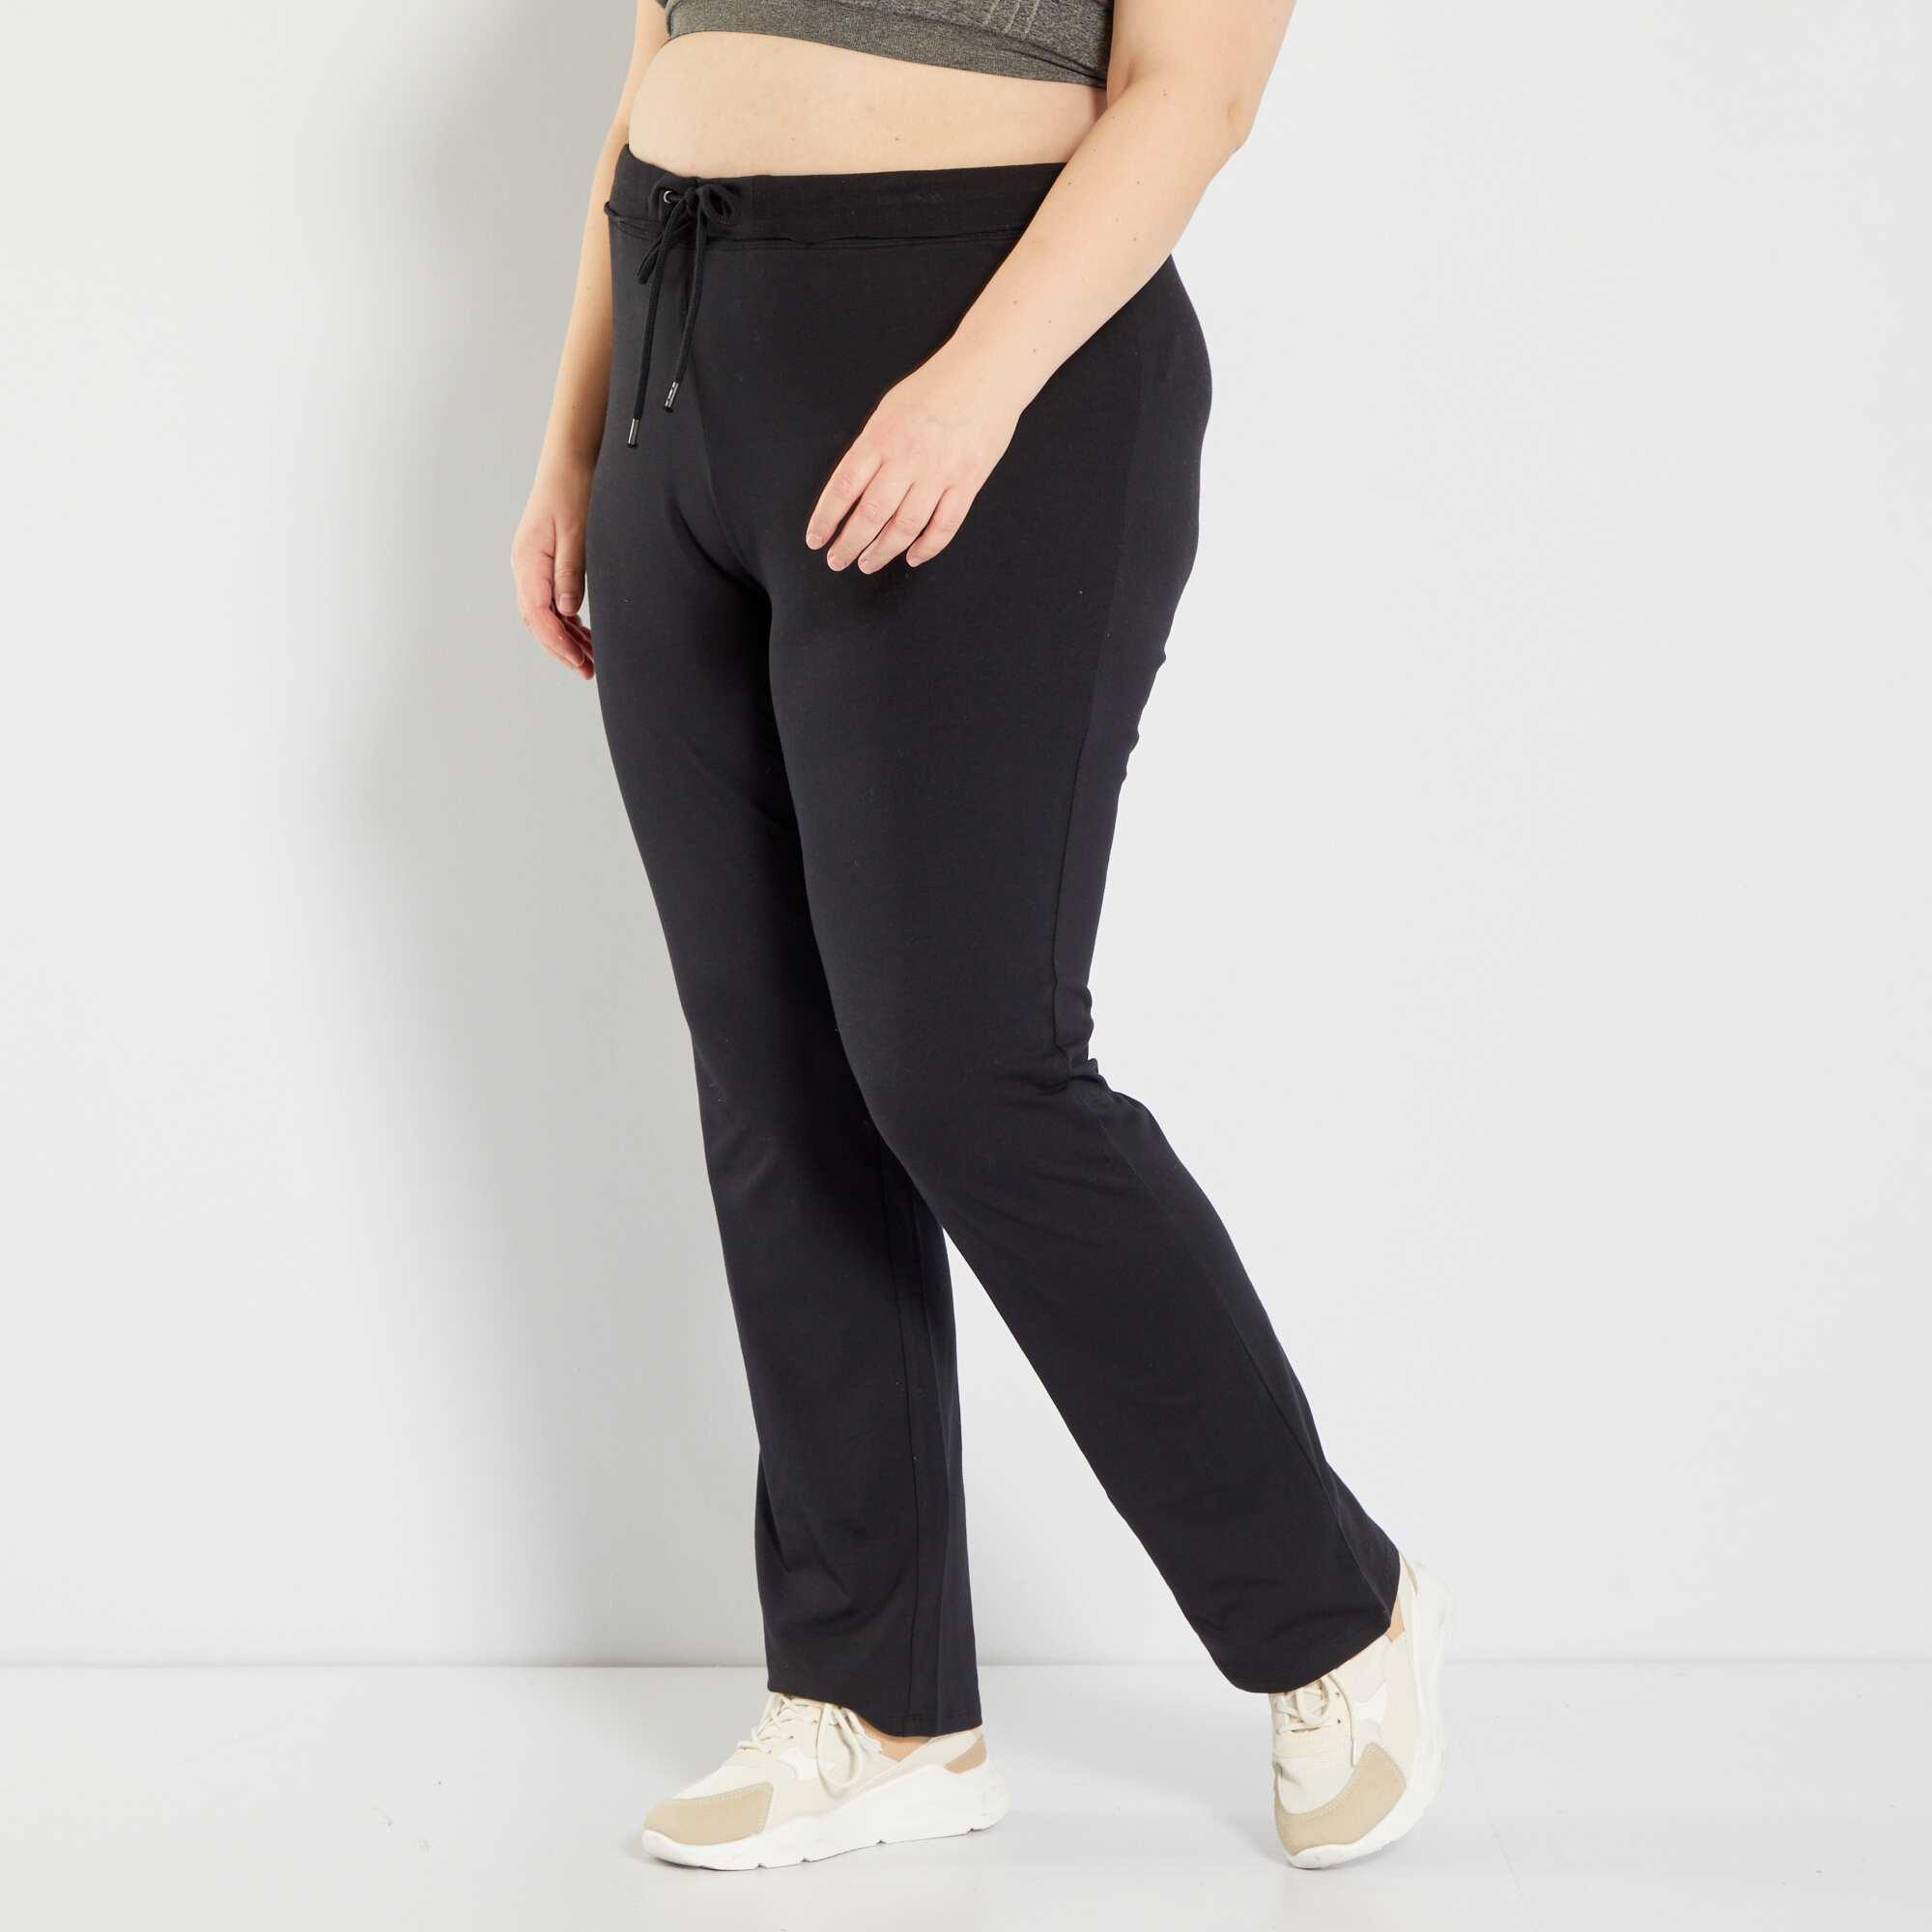 pantalon de sport en molleton grande taille femme kiabi. Black Bedroom Furniture Sets. Home Design Ideas